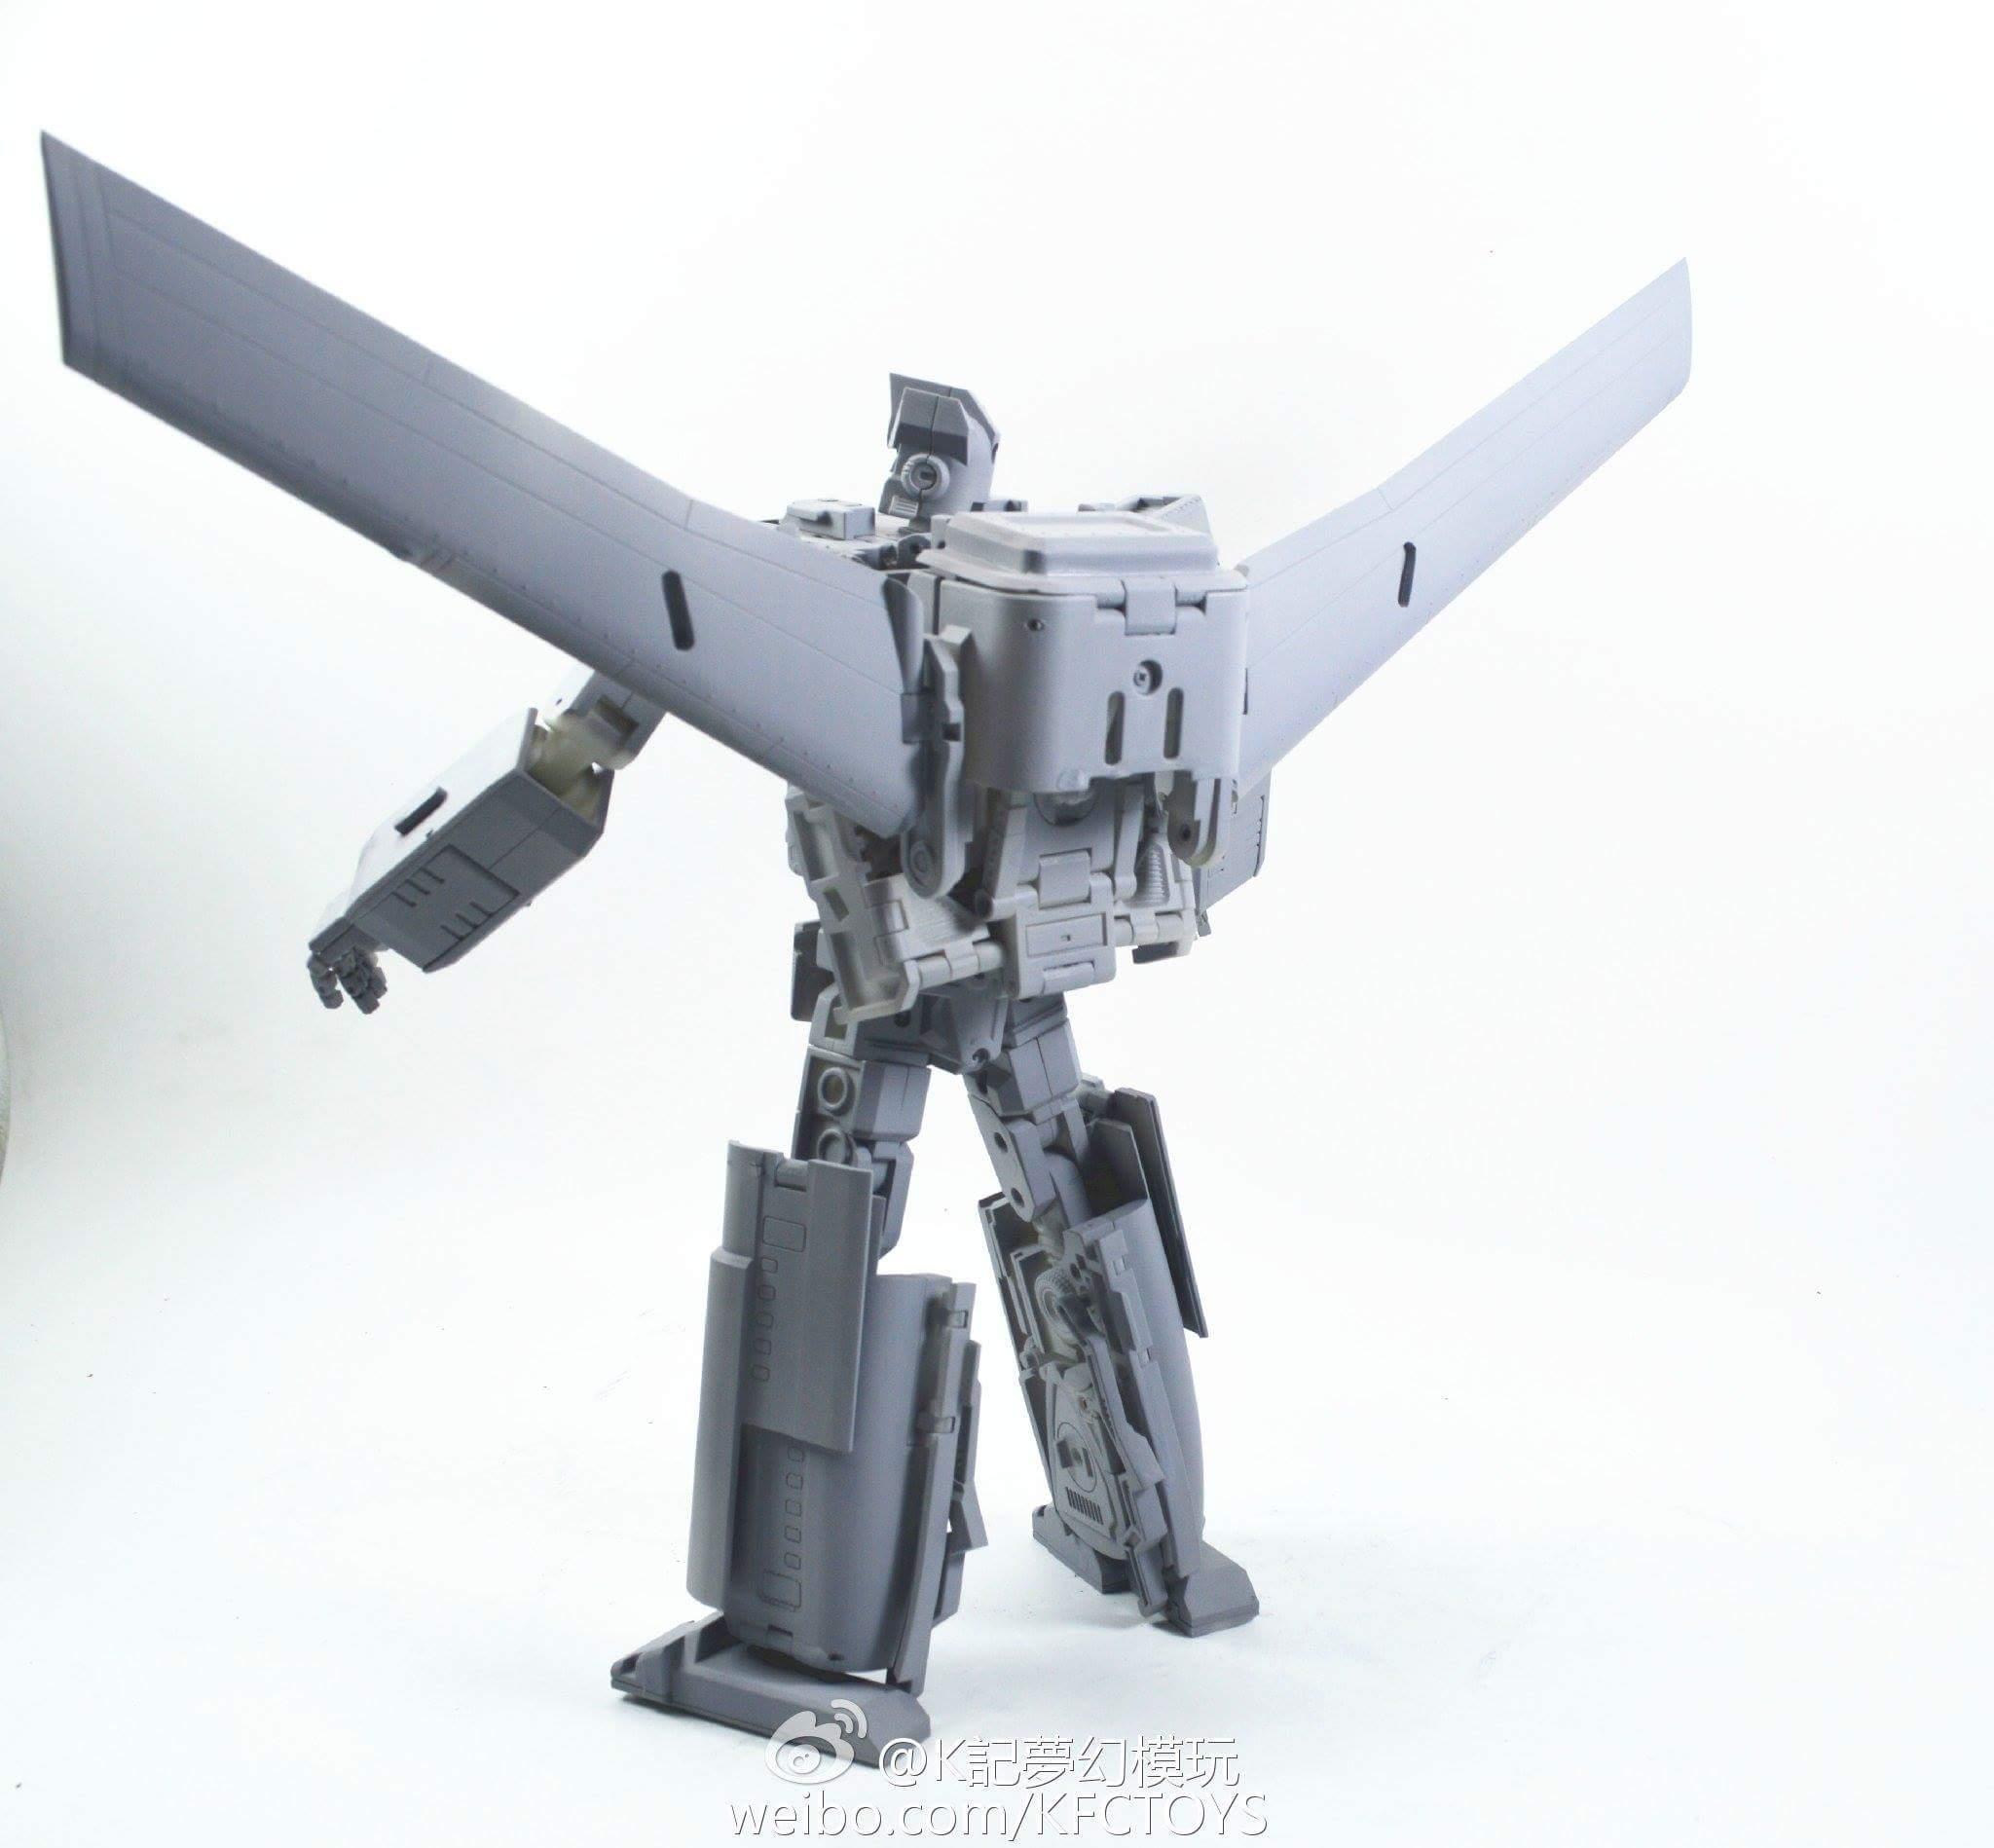 [KFC Toys] Produit Tiers - Jouet E.A.V.I Metal Phase 11A Stratotanker - aka Octane PUJJuYiW